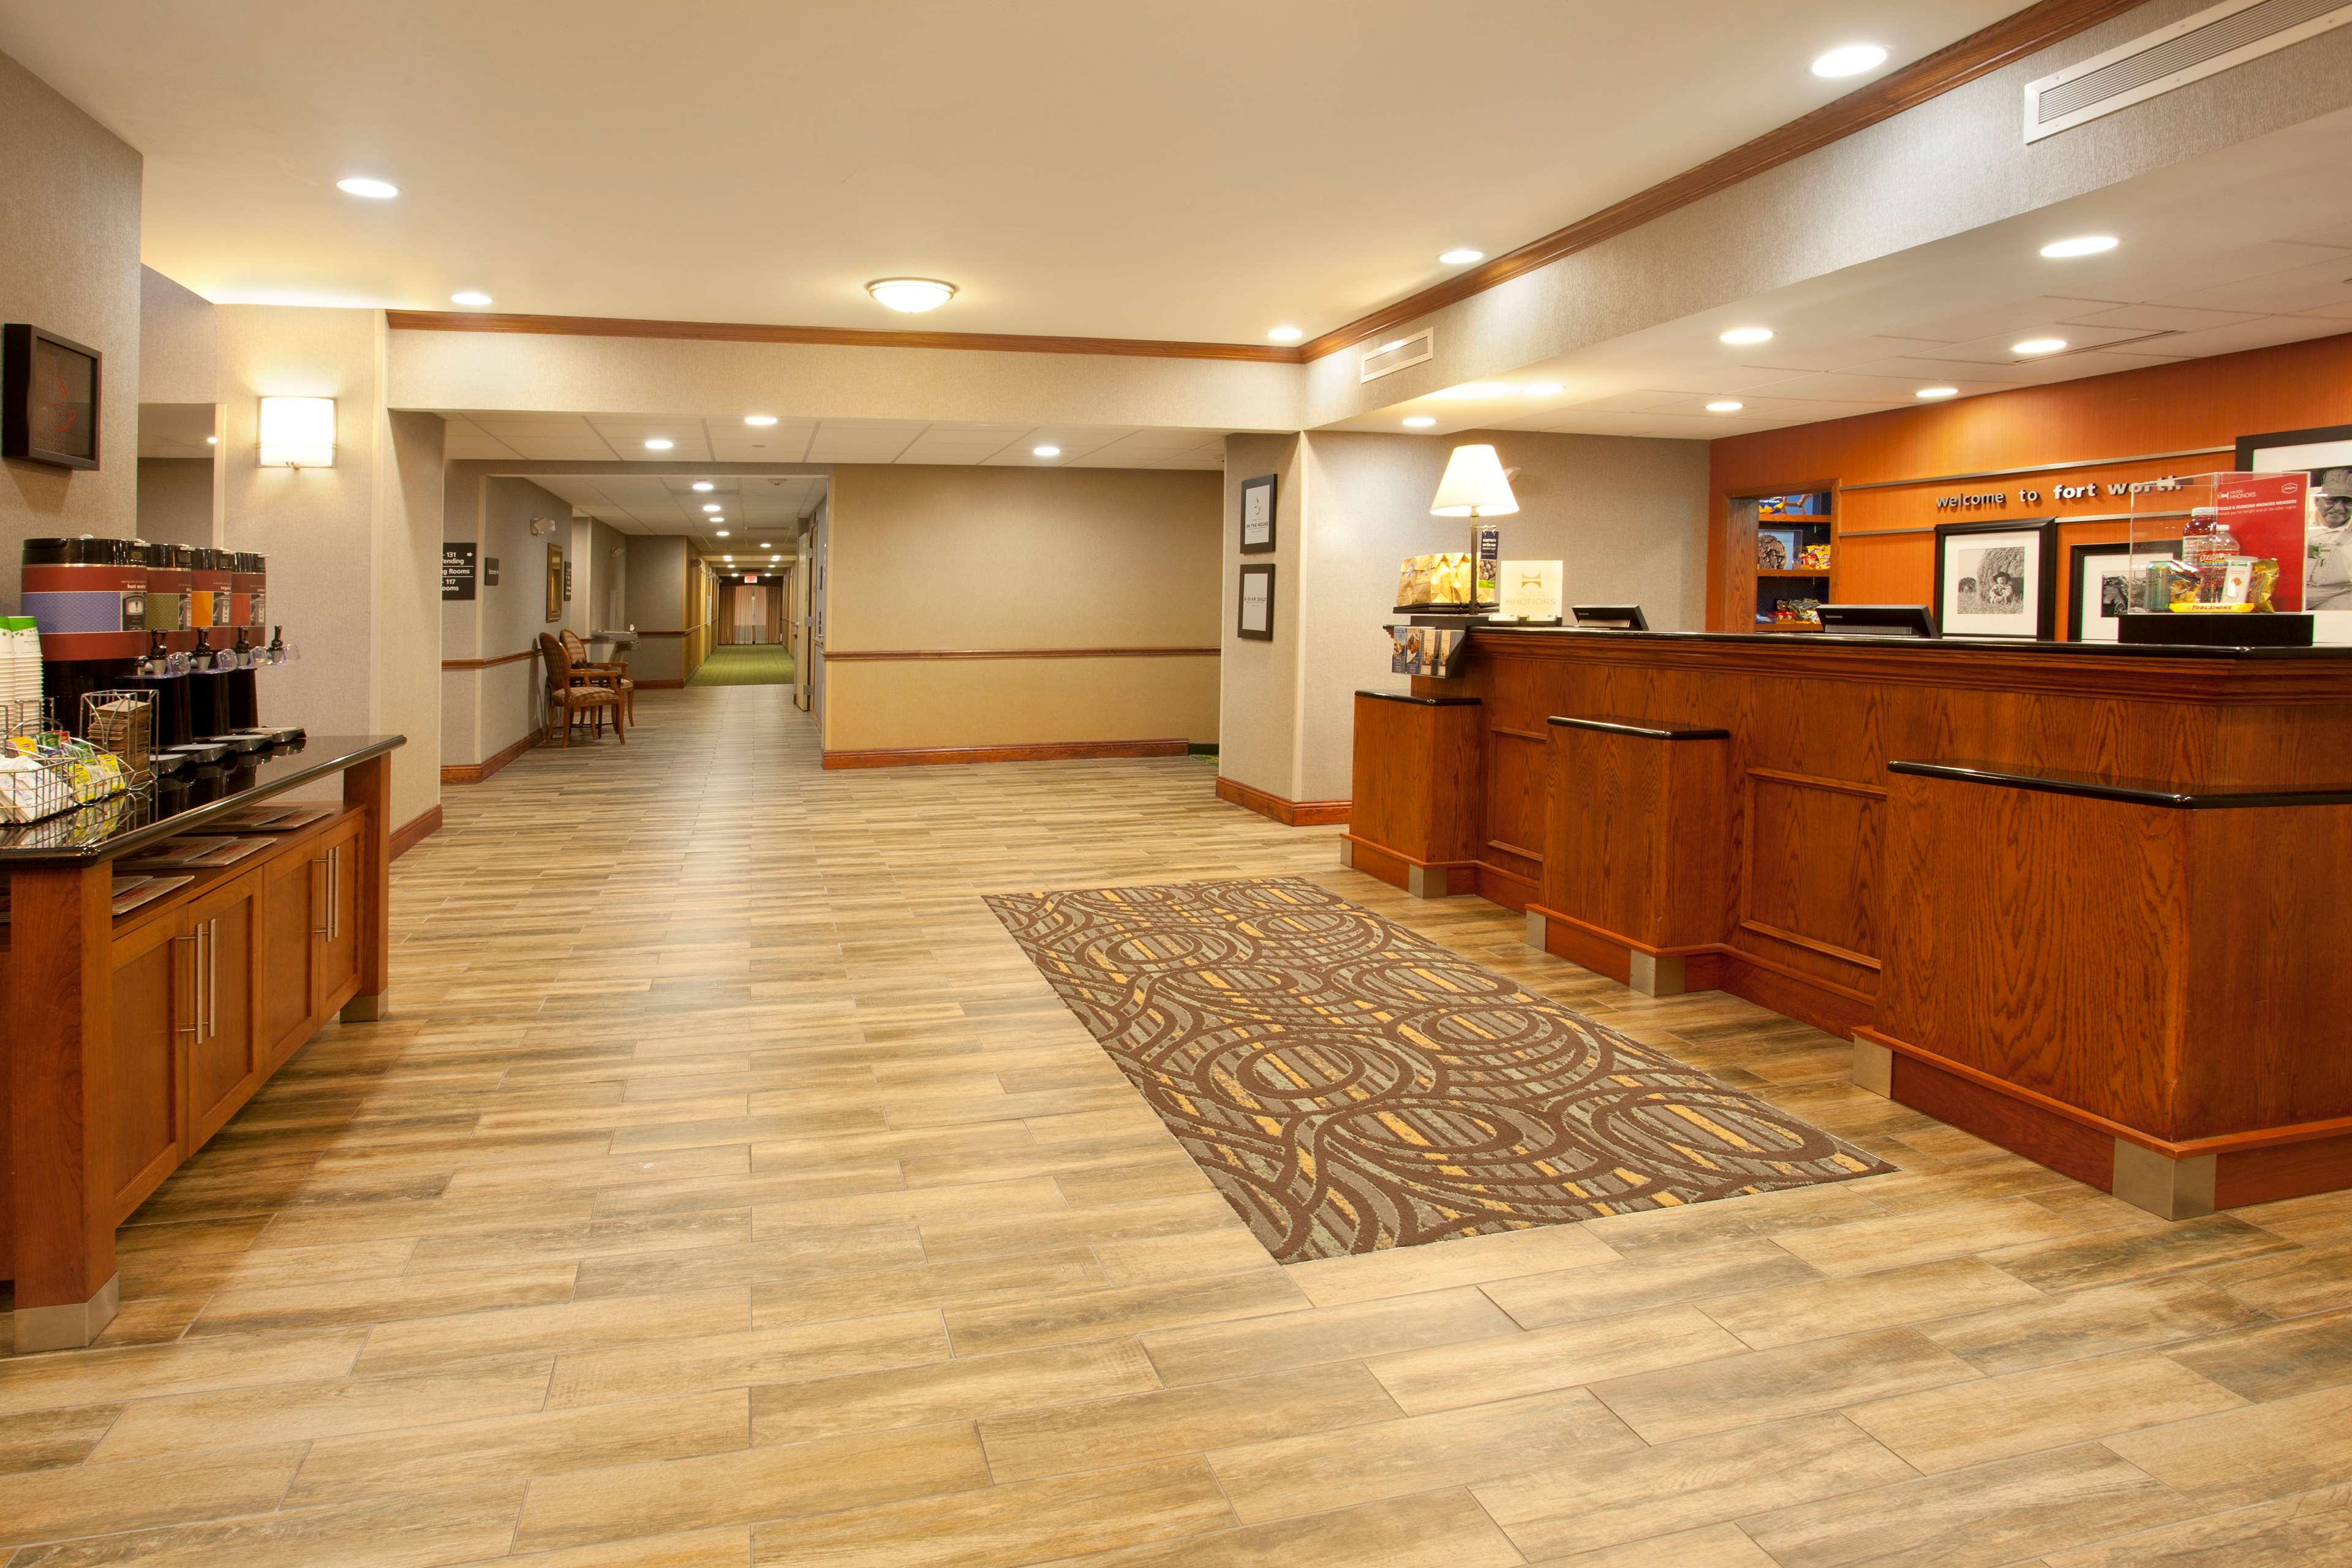 Hampton Inn & Suites Fort Worth-West-I-30 image 3